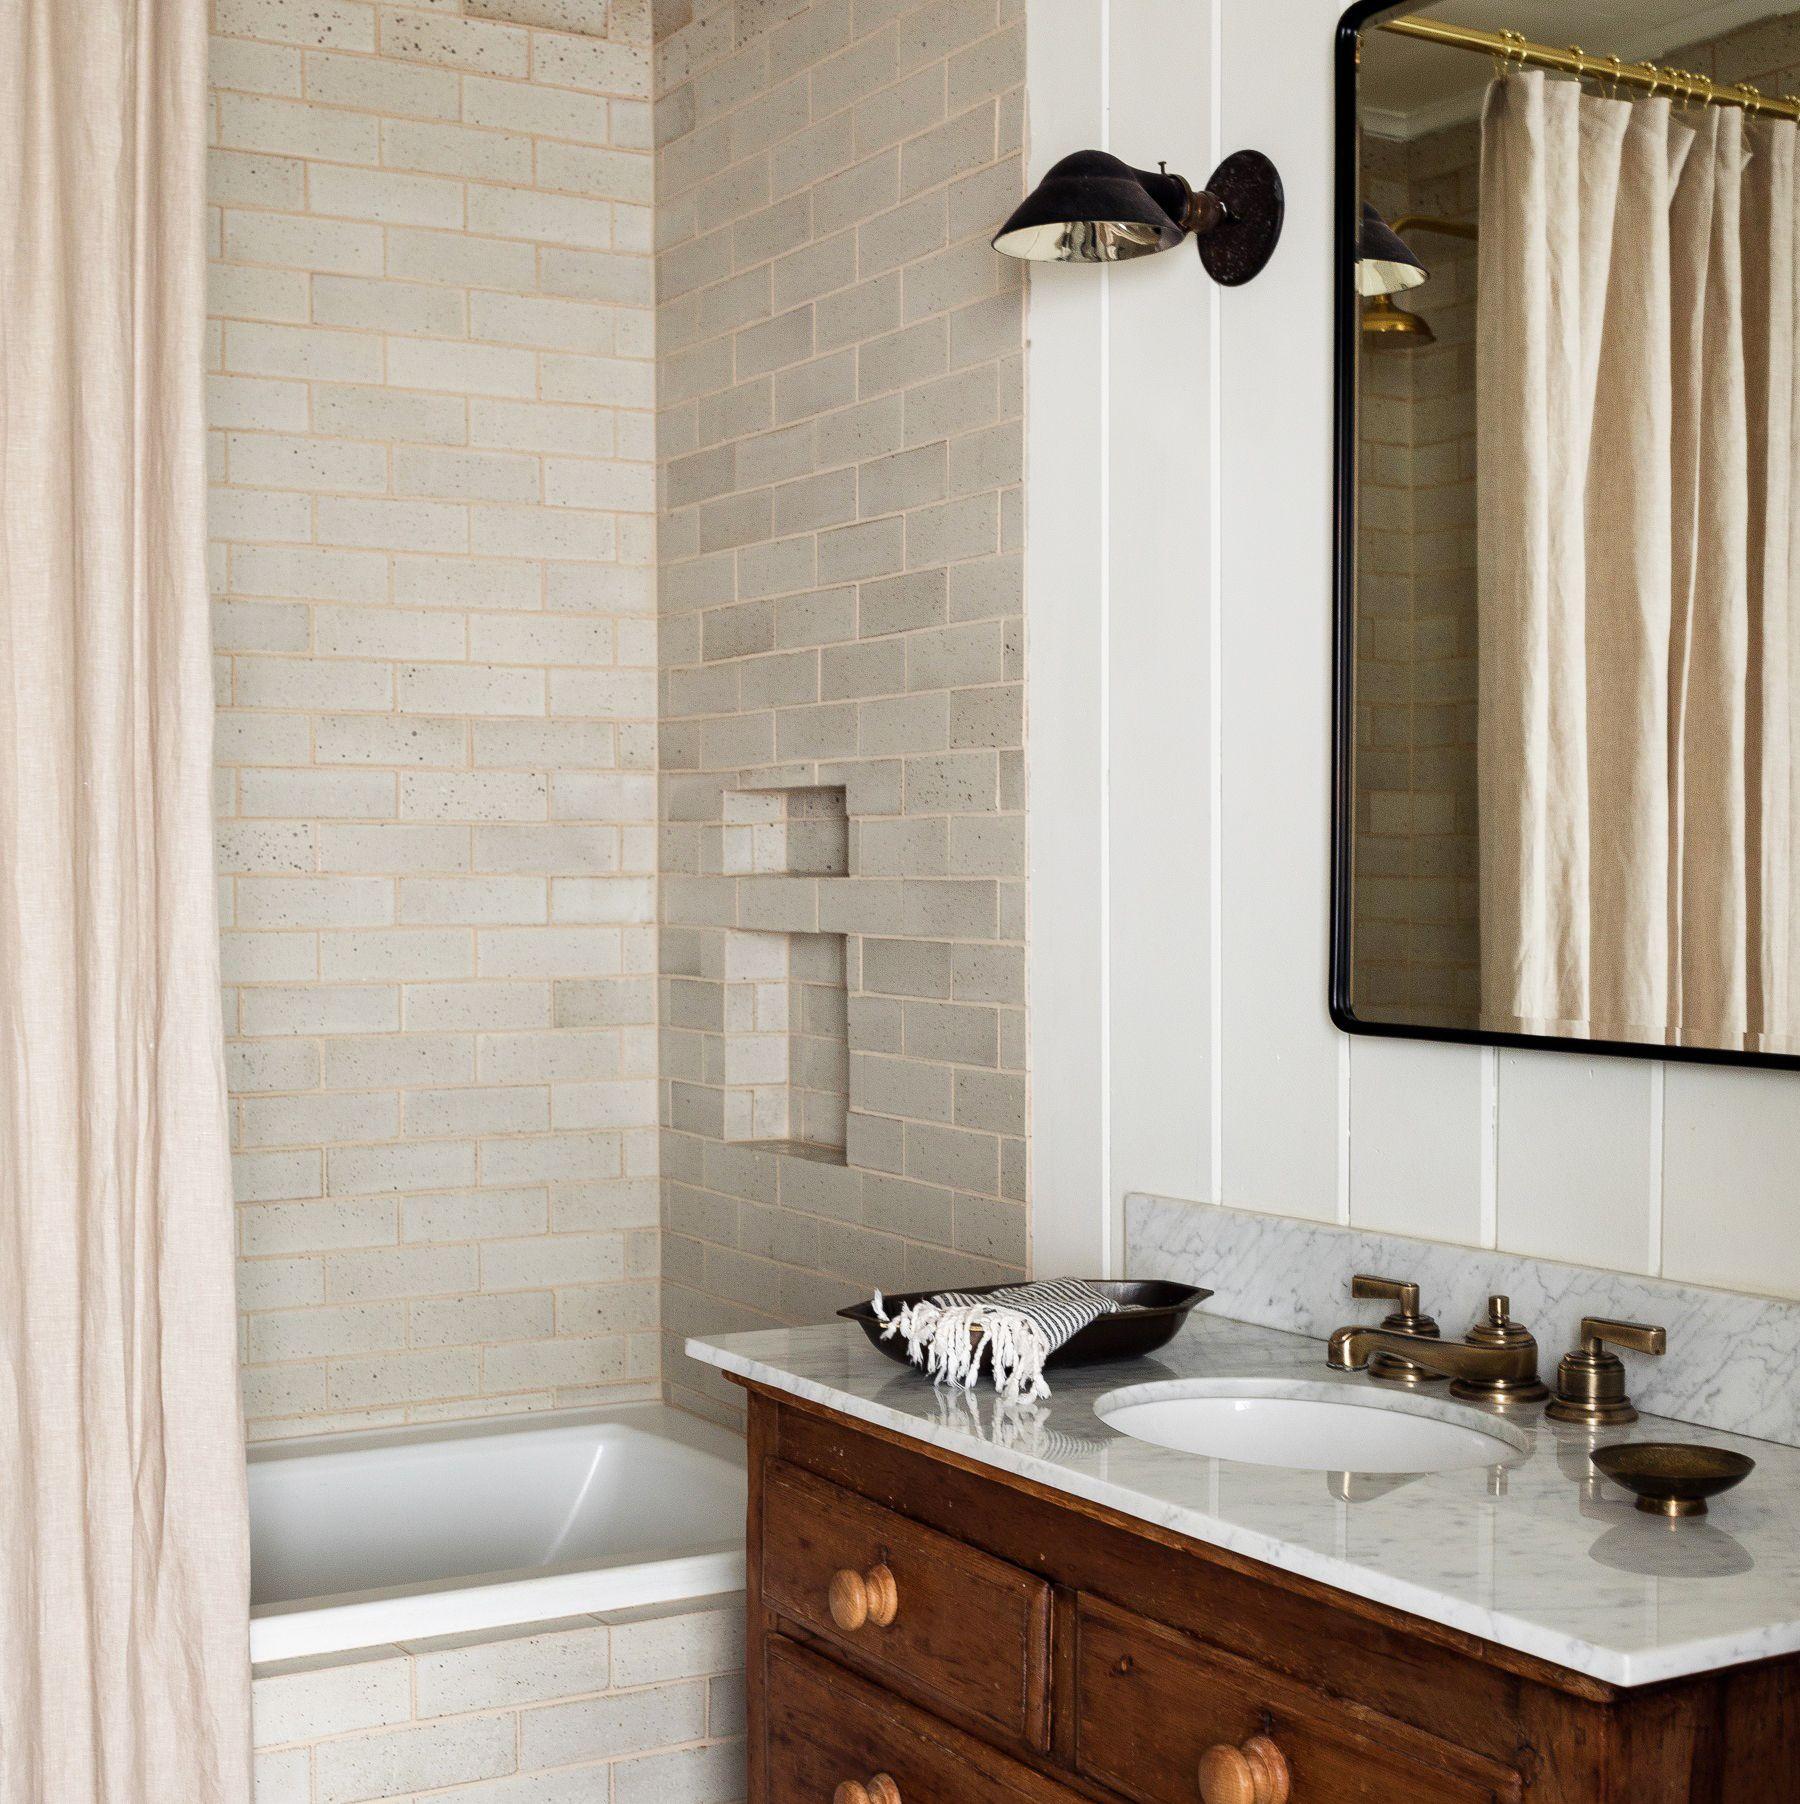 Penny Tile Bathroom | 15 Best Subway Tile Bathroom Designs In 2019 Subway Tile